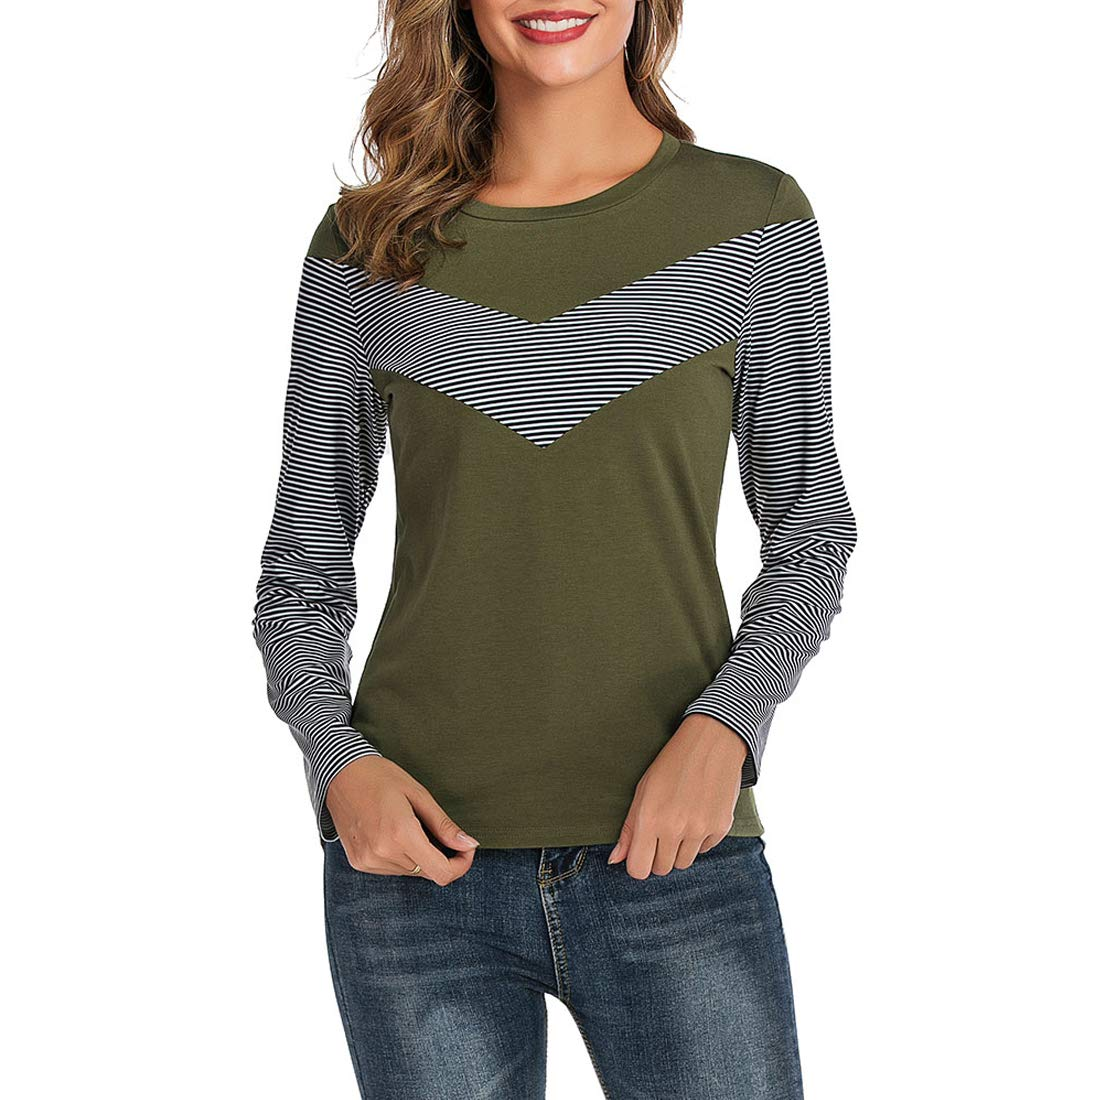 ROSESTAR Women Long Sleeve Striped Color Block Shirts Casual Lightweight Pullover Sweatshirt Tunic Tops